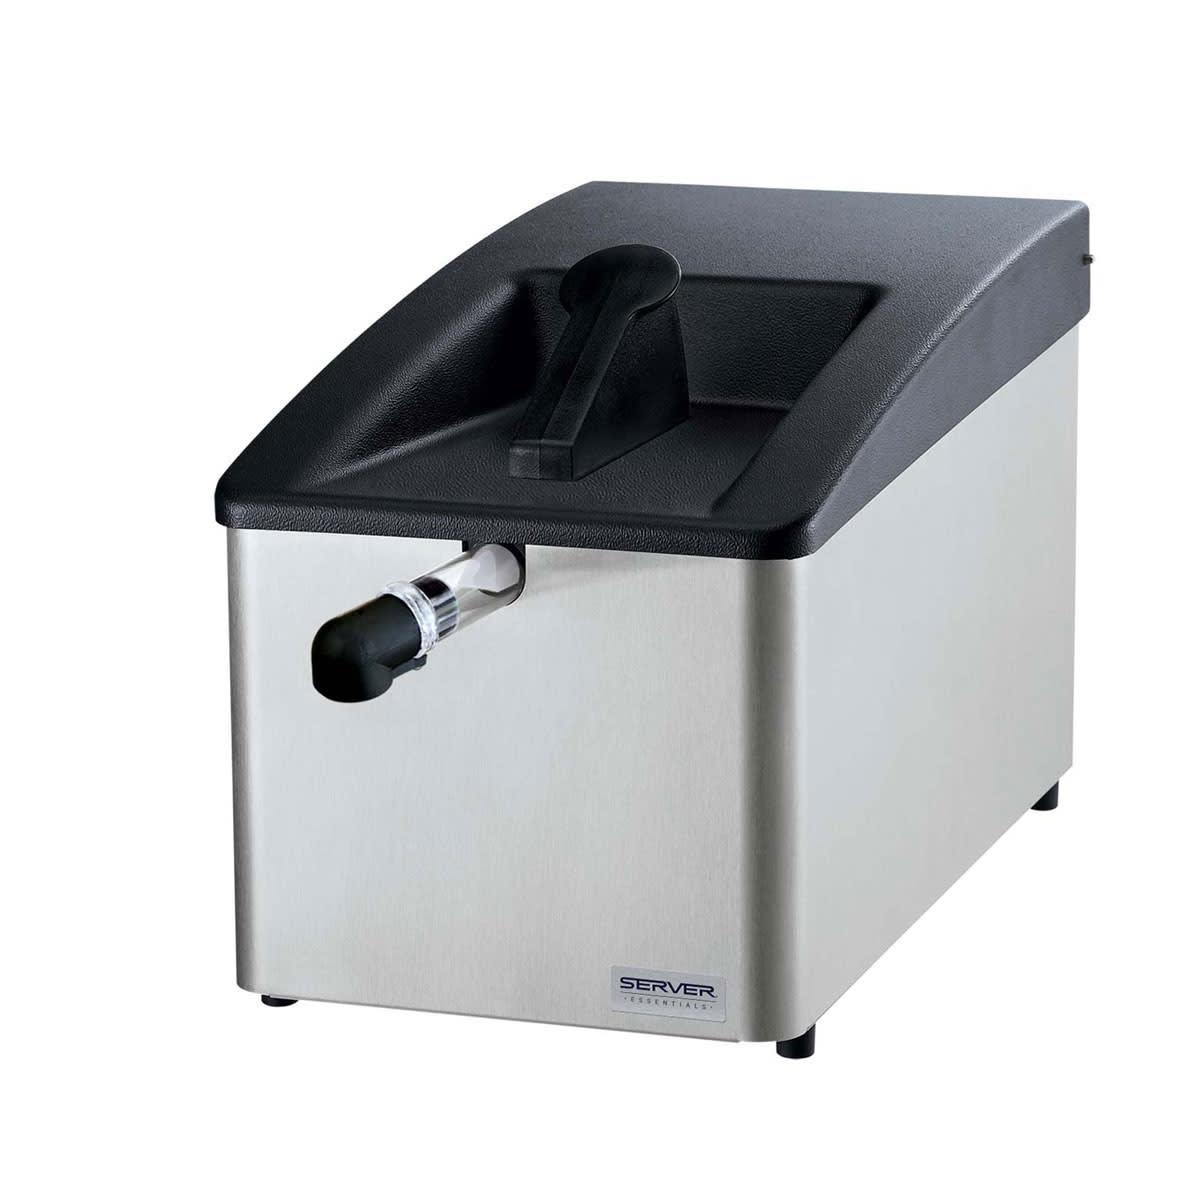 Server 07500 Extreme Countertop Dispenser, Single Unit, Cryovac Pouch, 3 Gallon